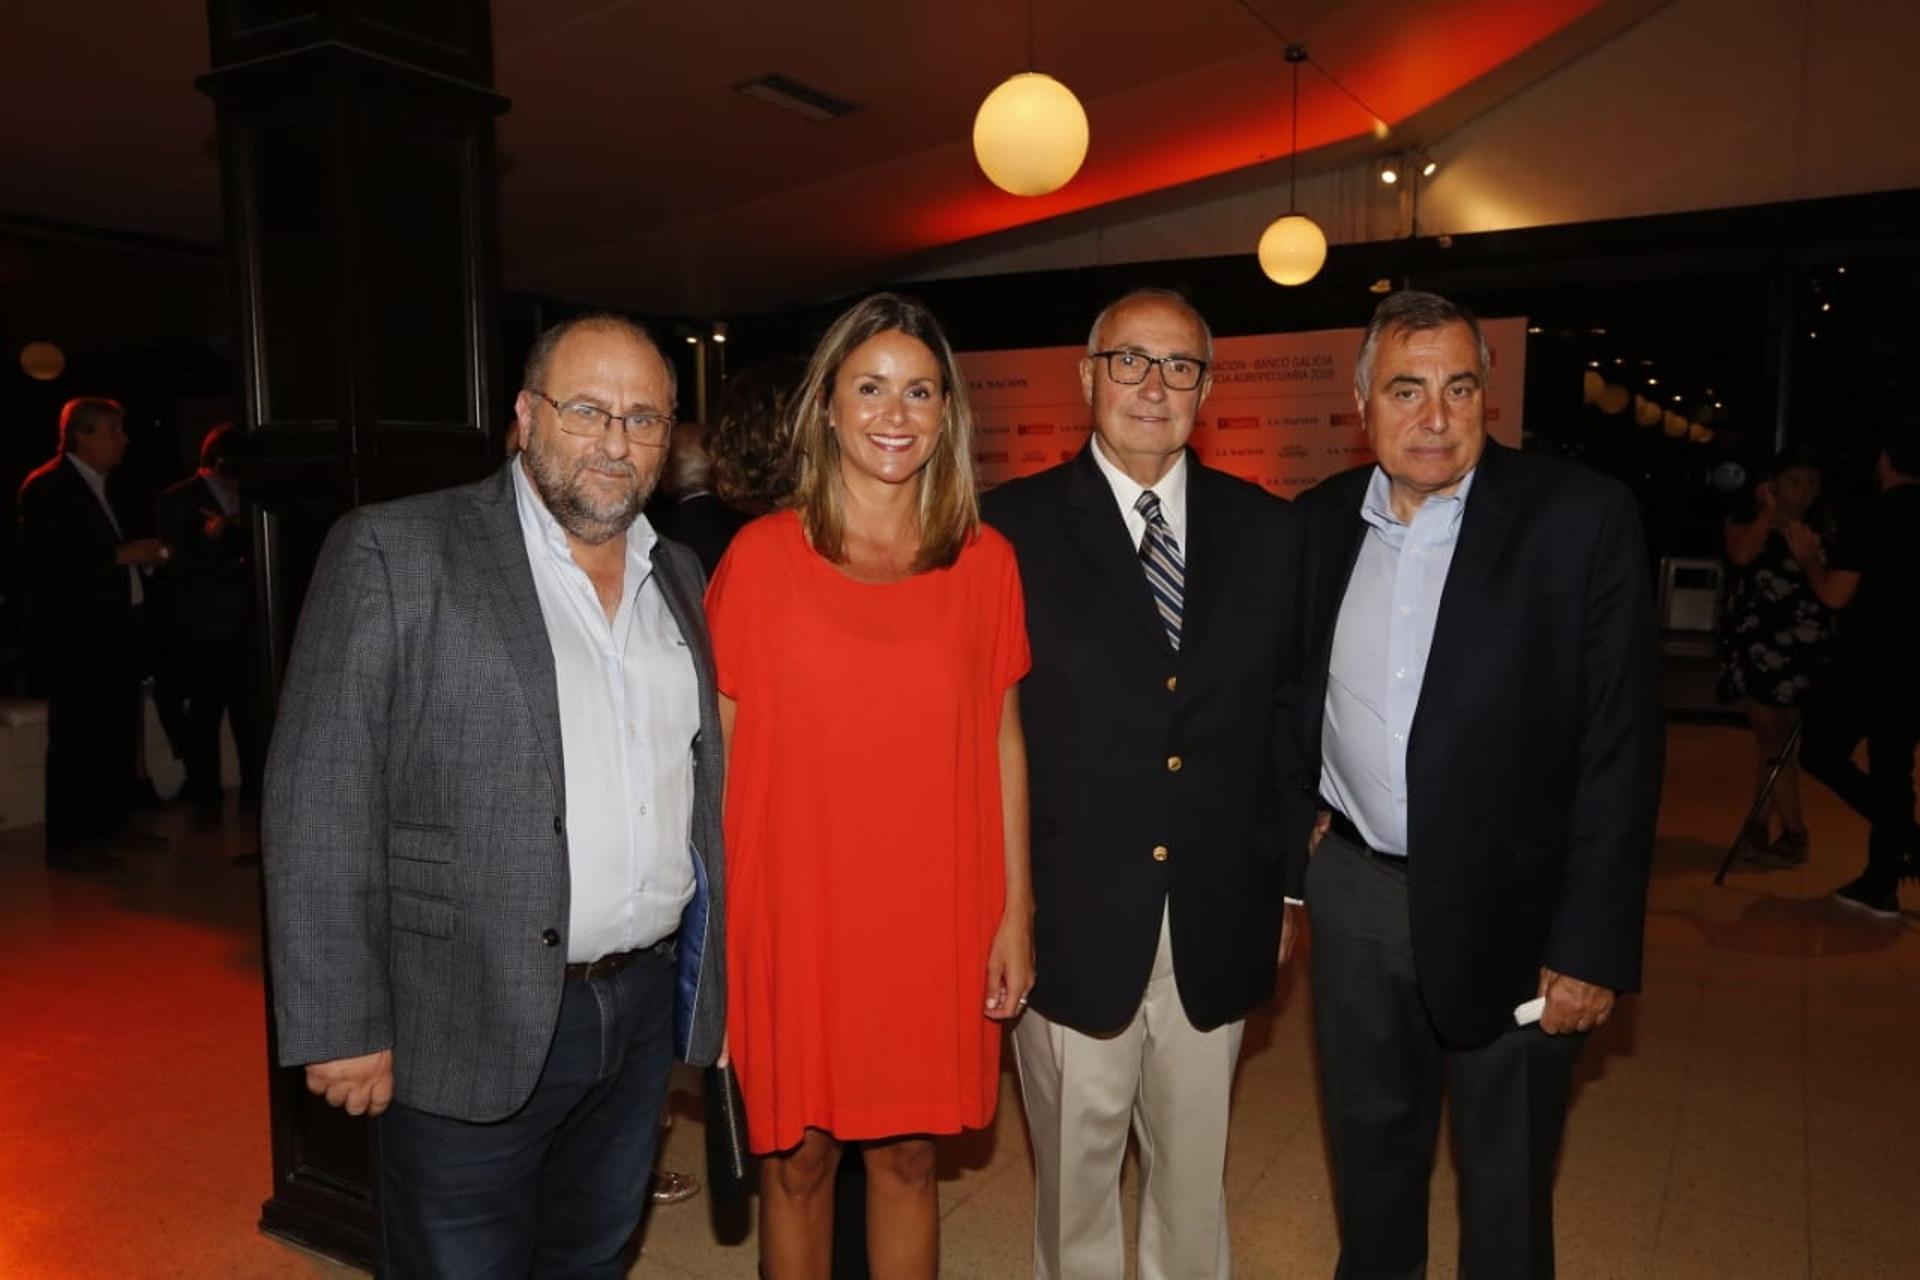 Juan Grassa, Marisa Bircher, Rodolfo Rossi y Ricardo Yapur